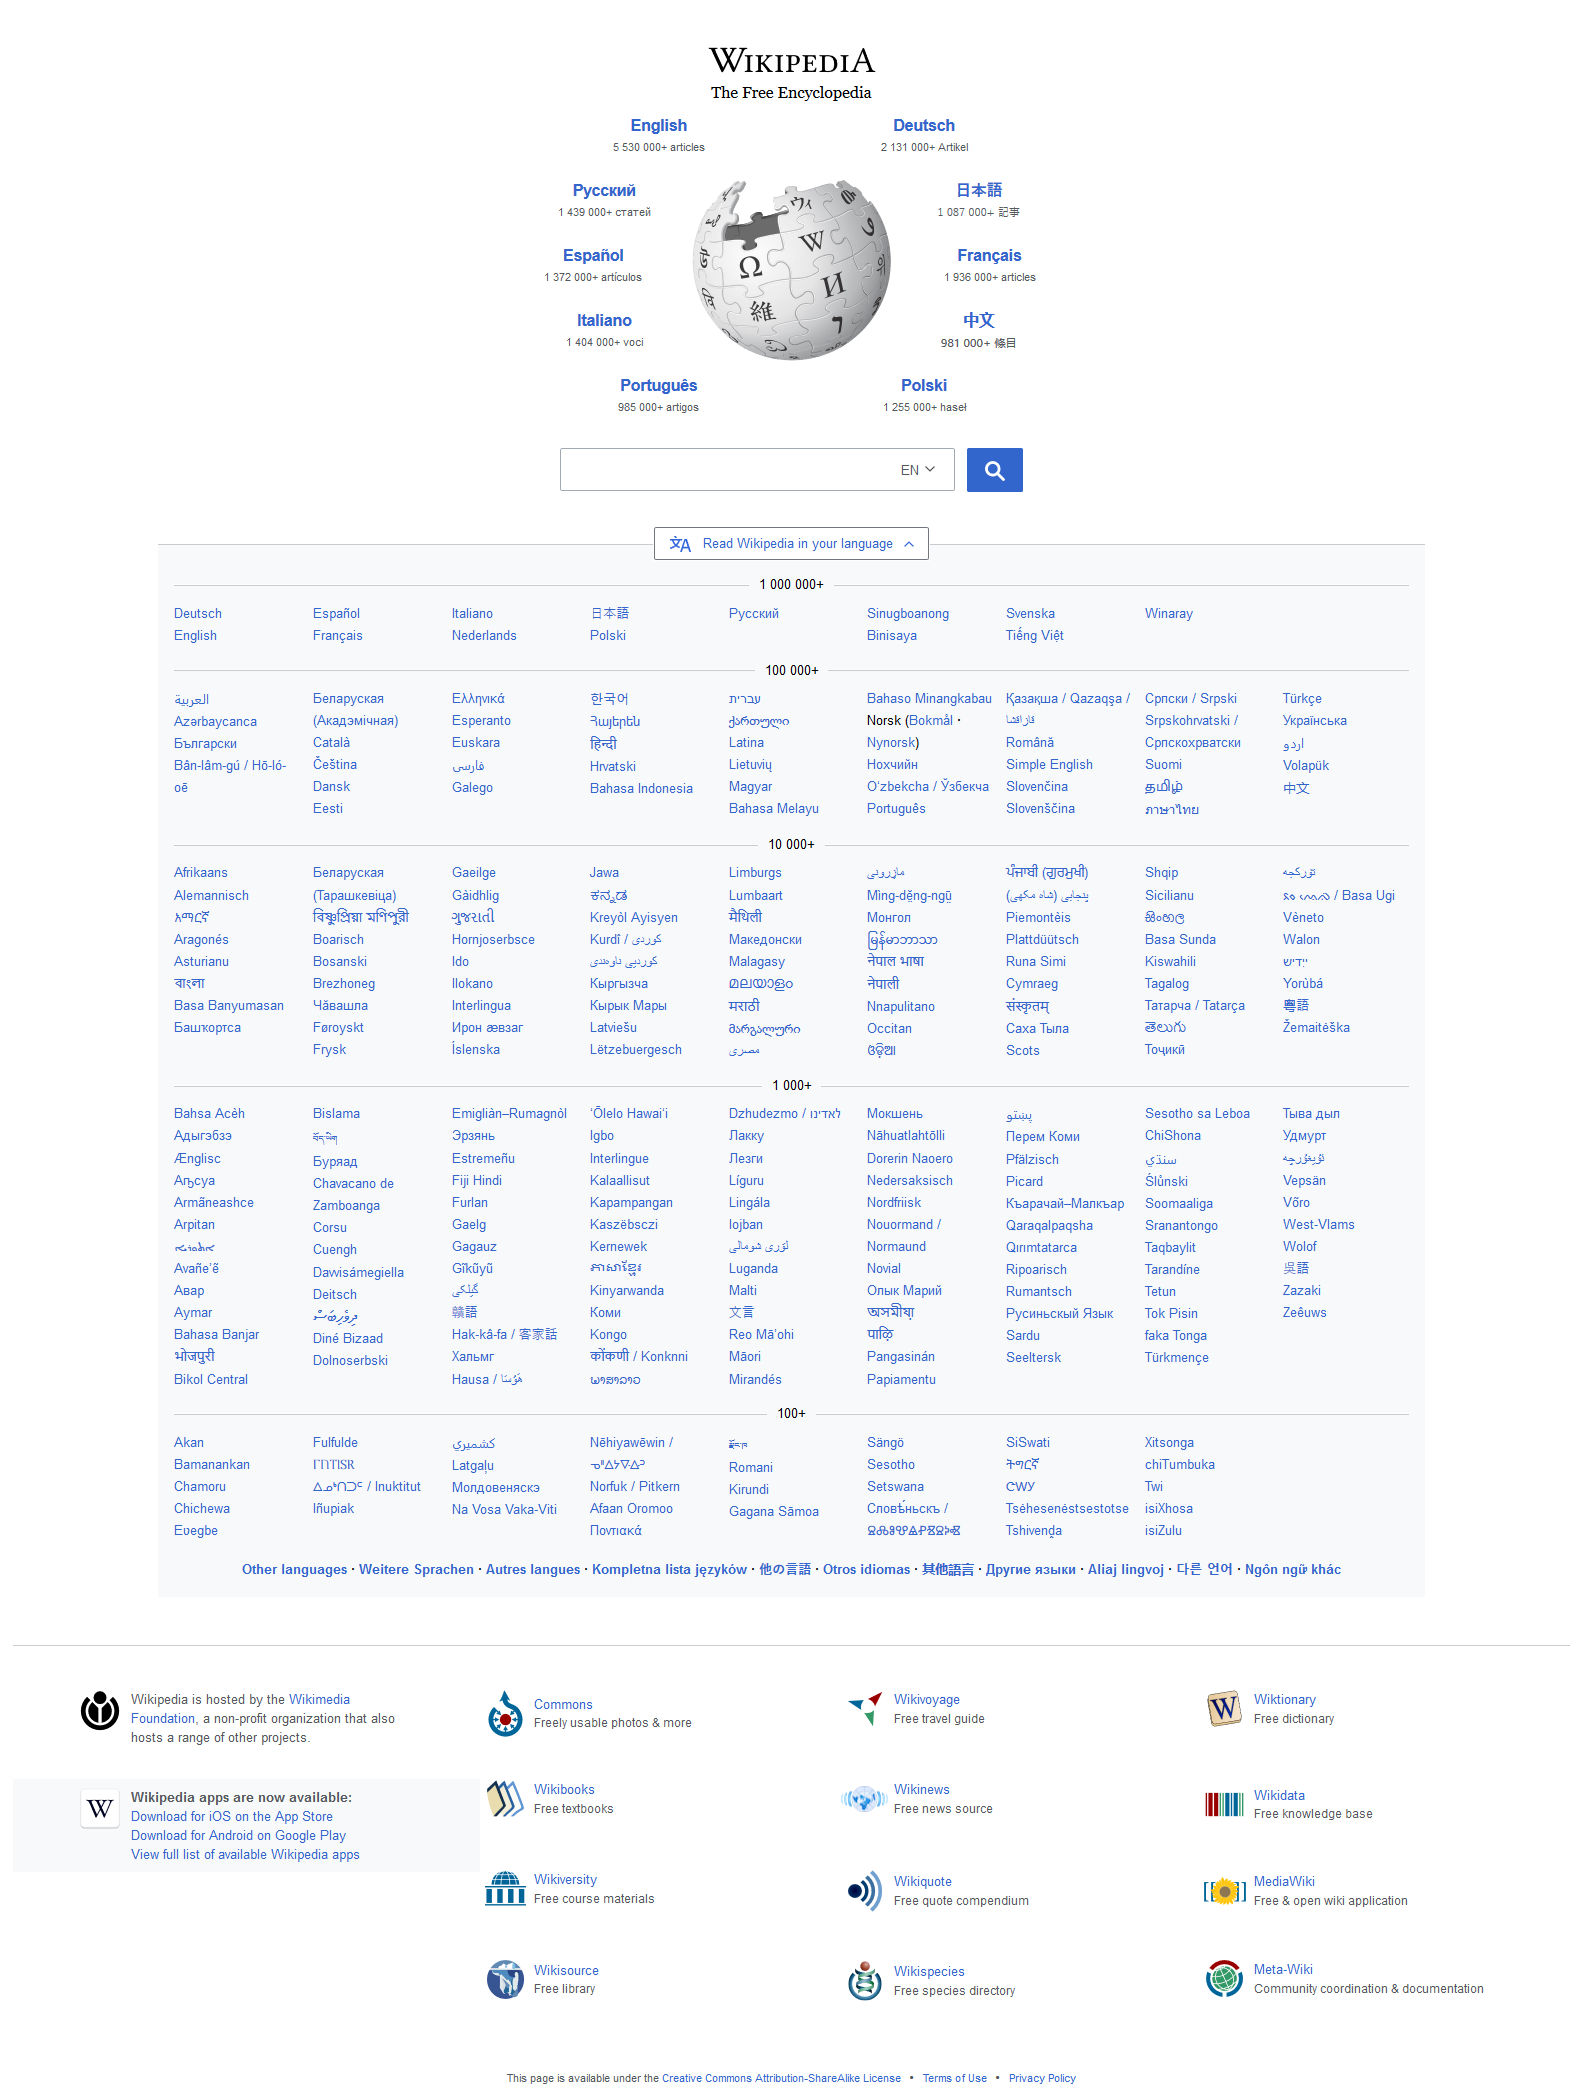 Сайт — Википедия with regard to Erd Wiki